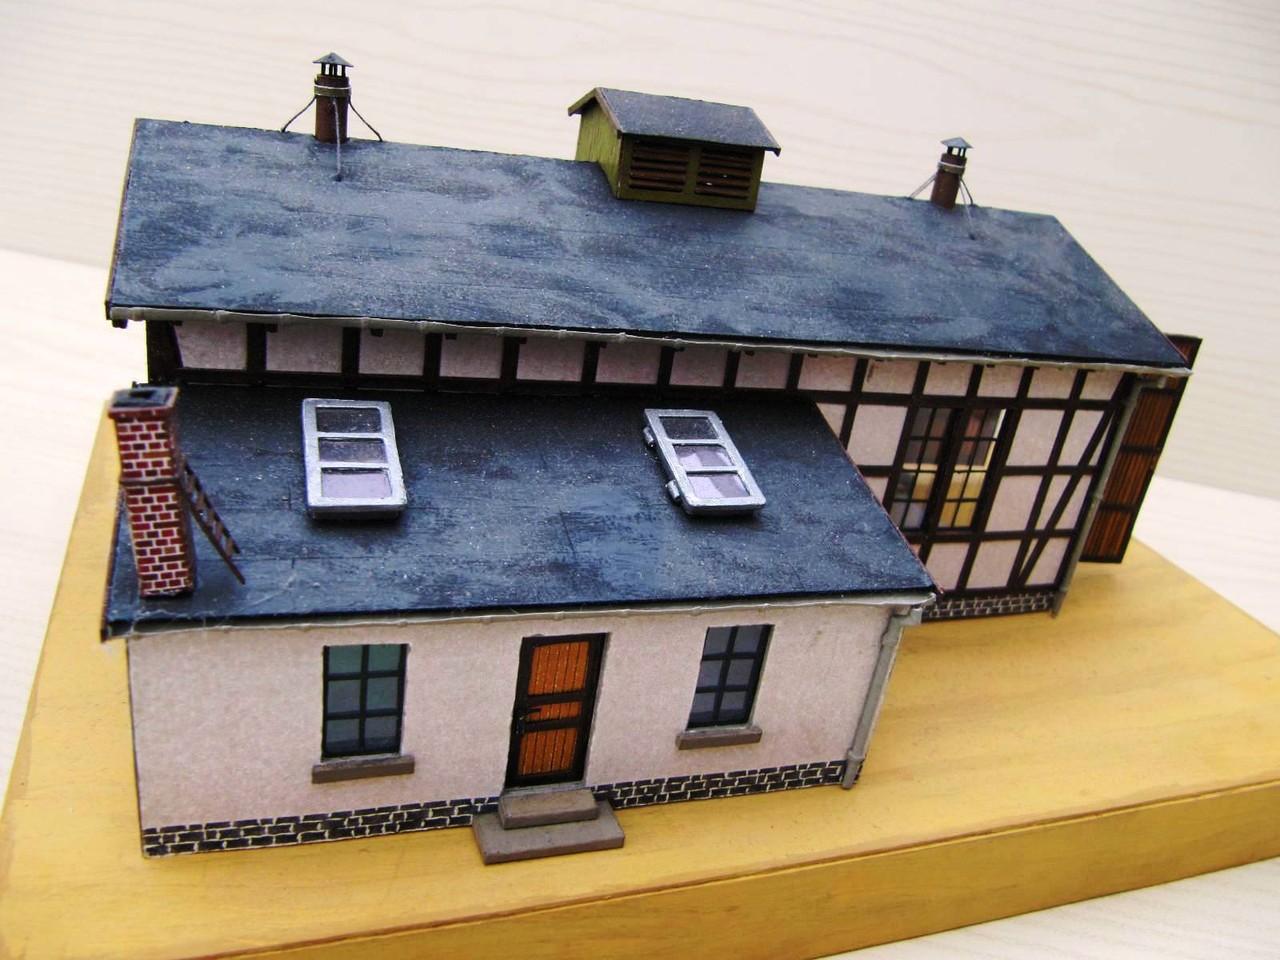 (c) W. Fehse - Dachfenster 1:87 (H0)